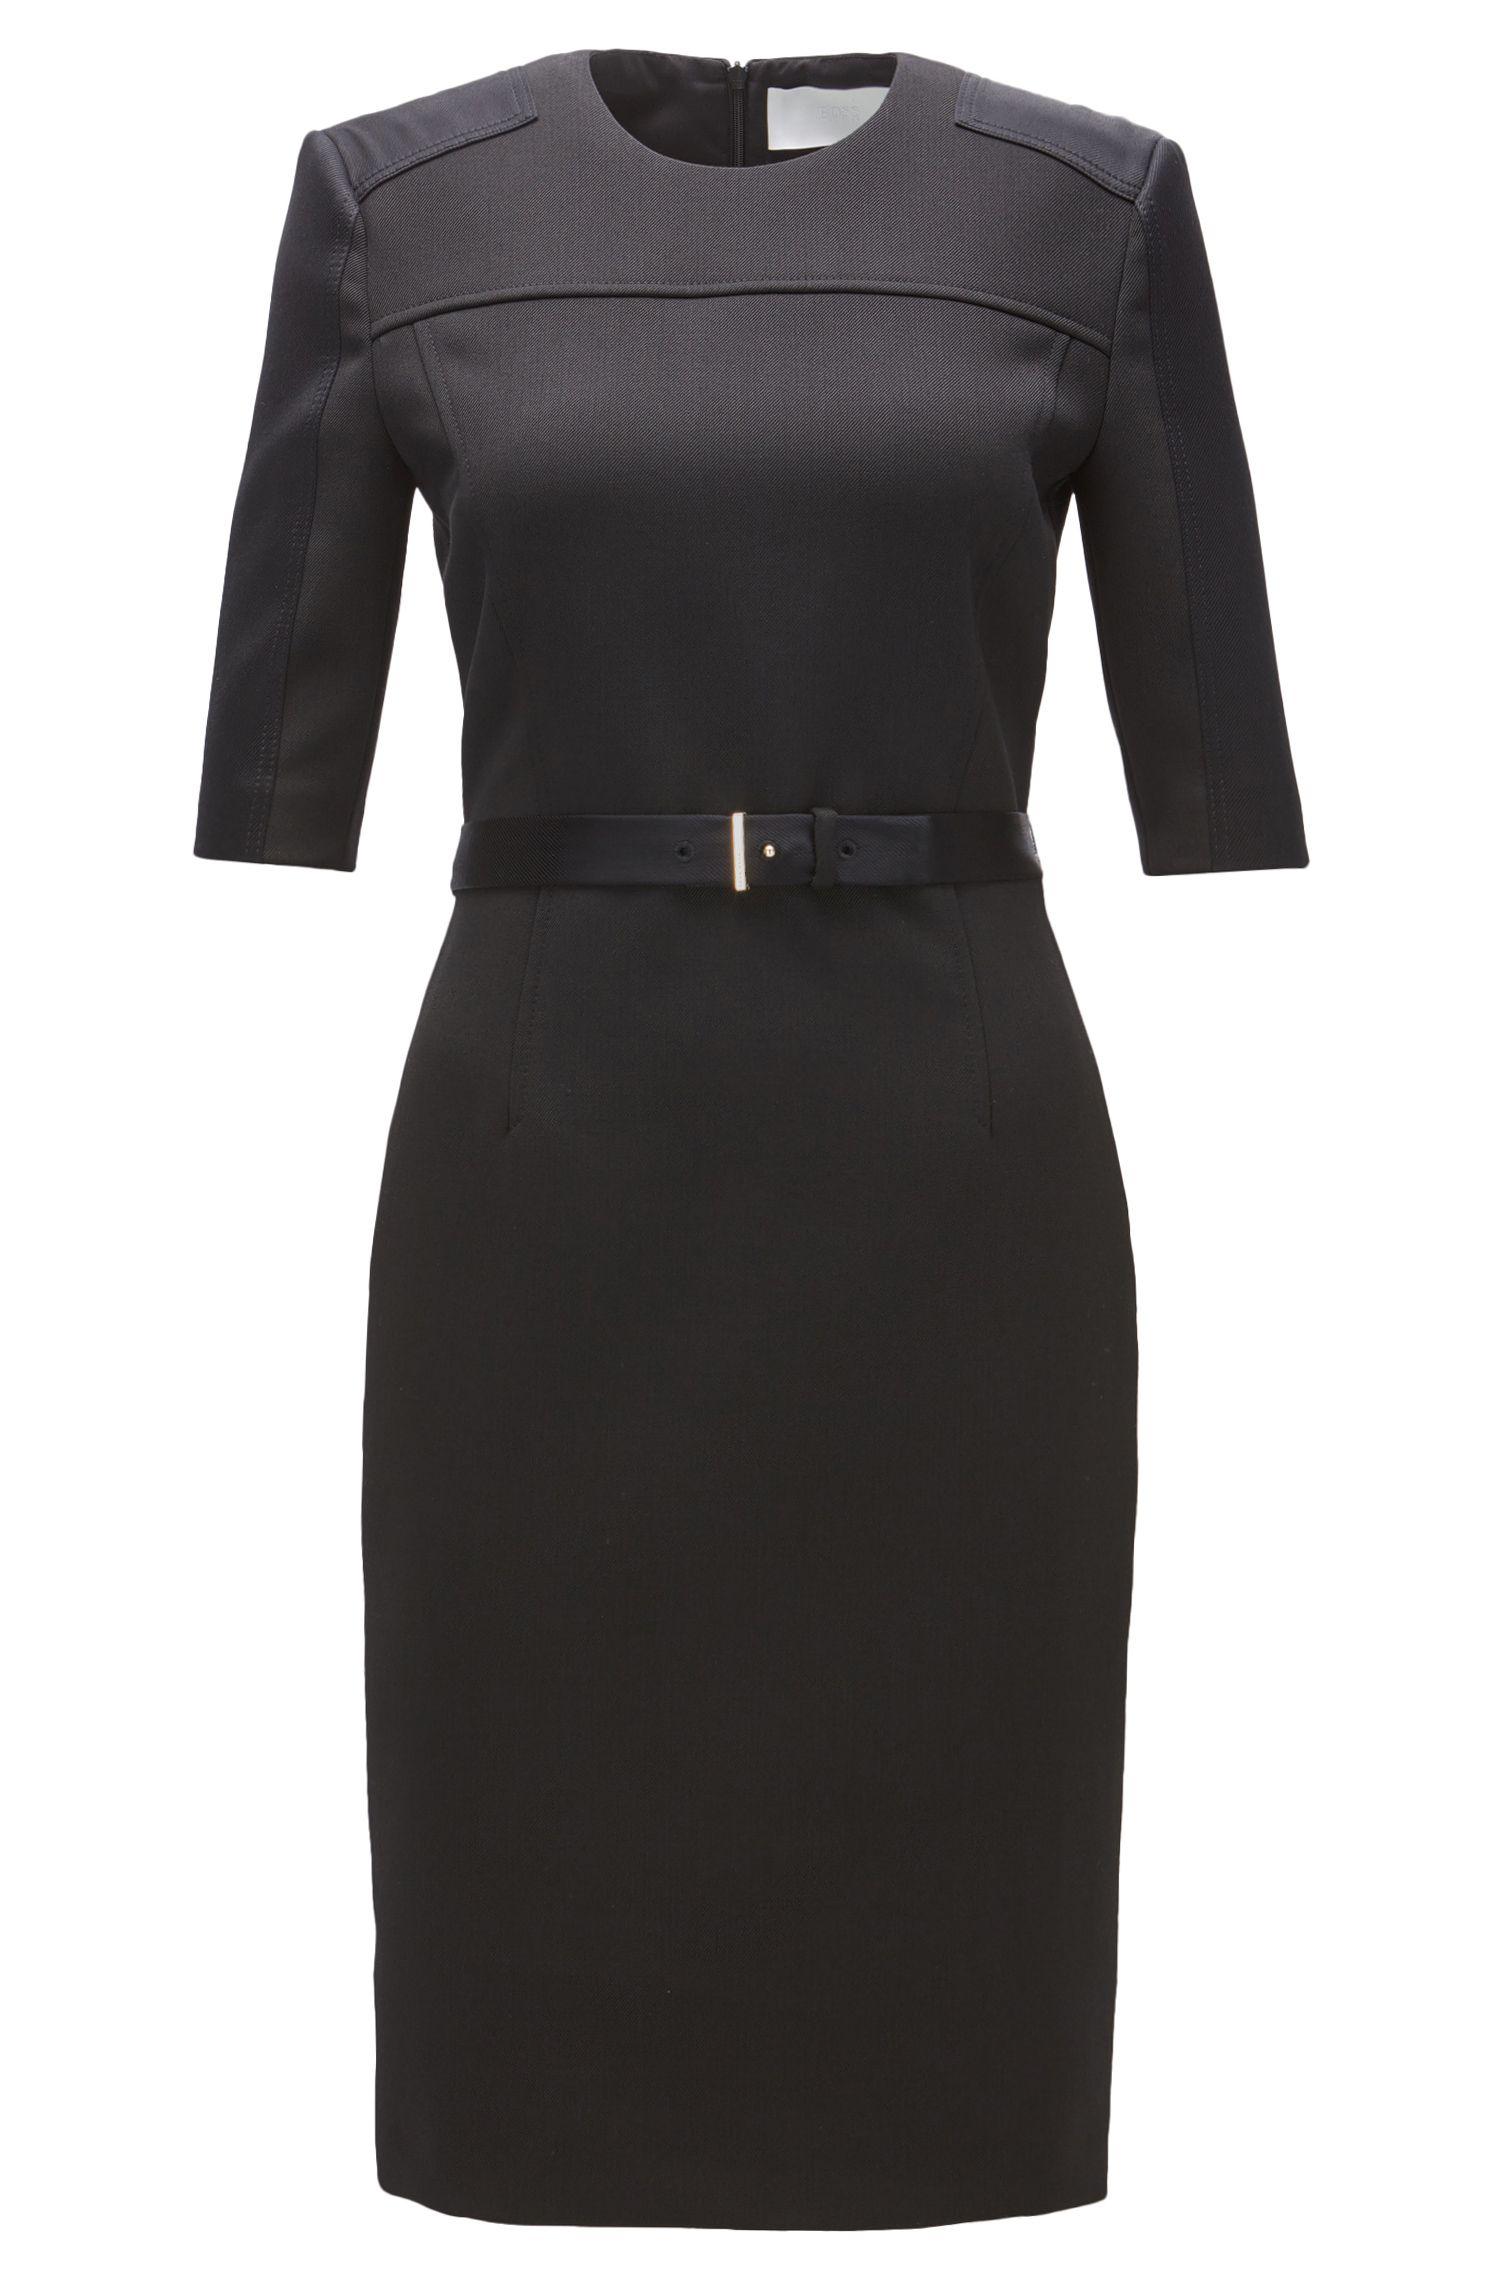 Belted Stretch Sheath Dress | Dakulia